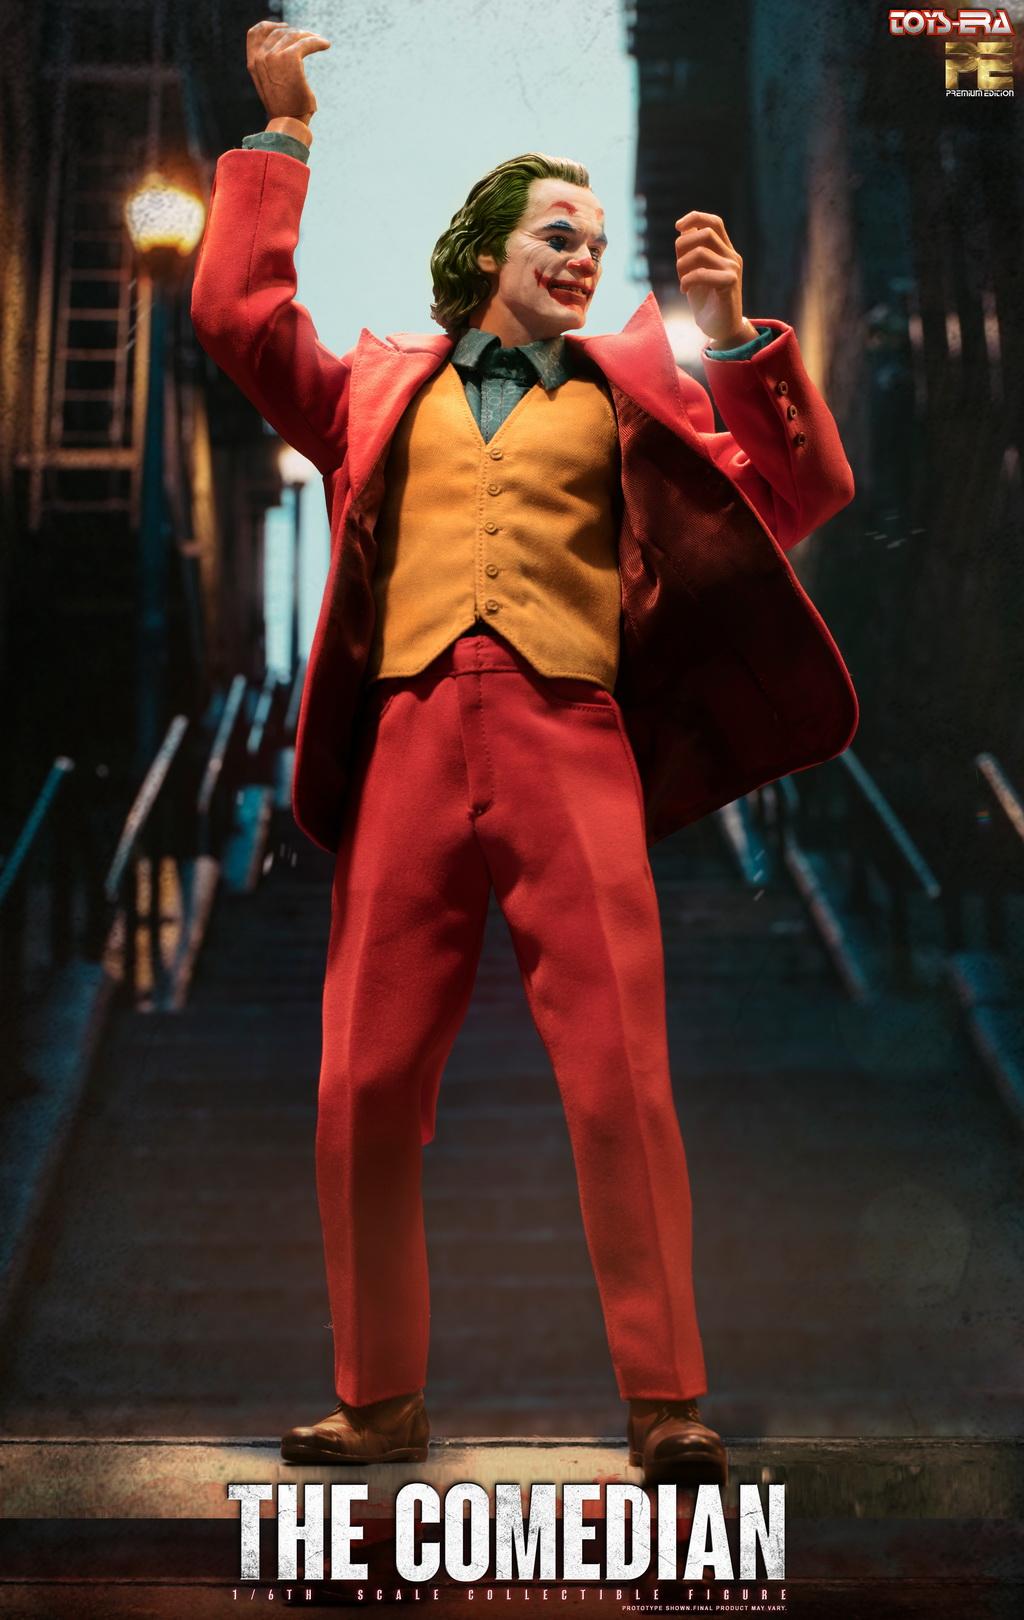 1//6 Arthur Fleck Joker Toys Era PE004 Hot Comedian Humorist Joaquin Phoenix